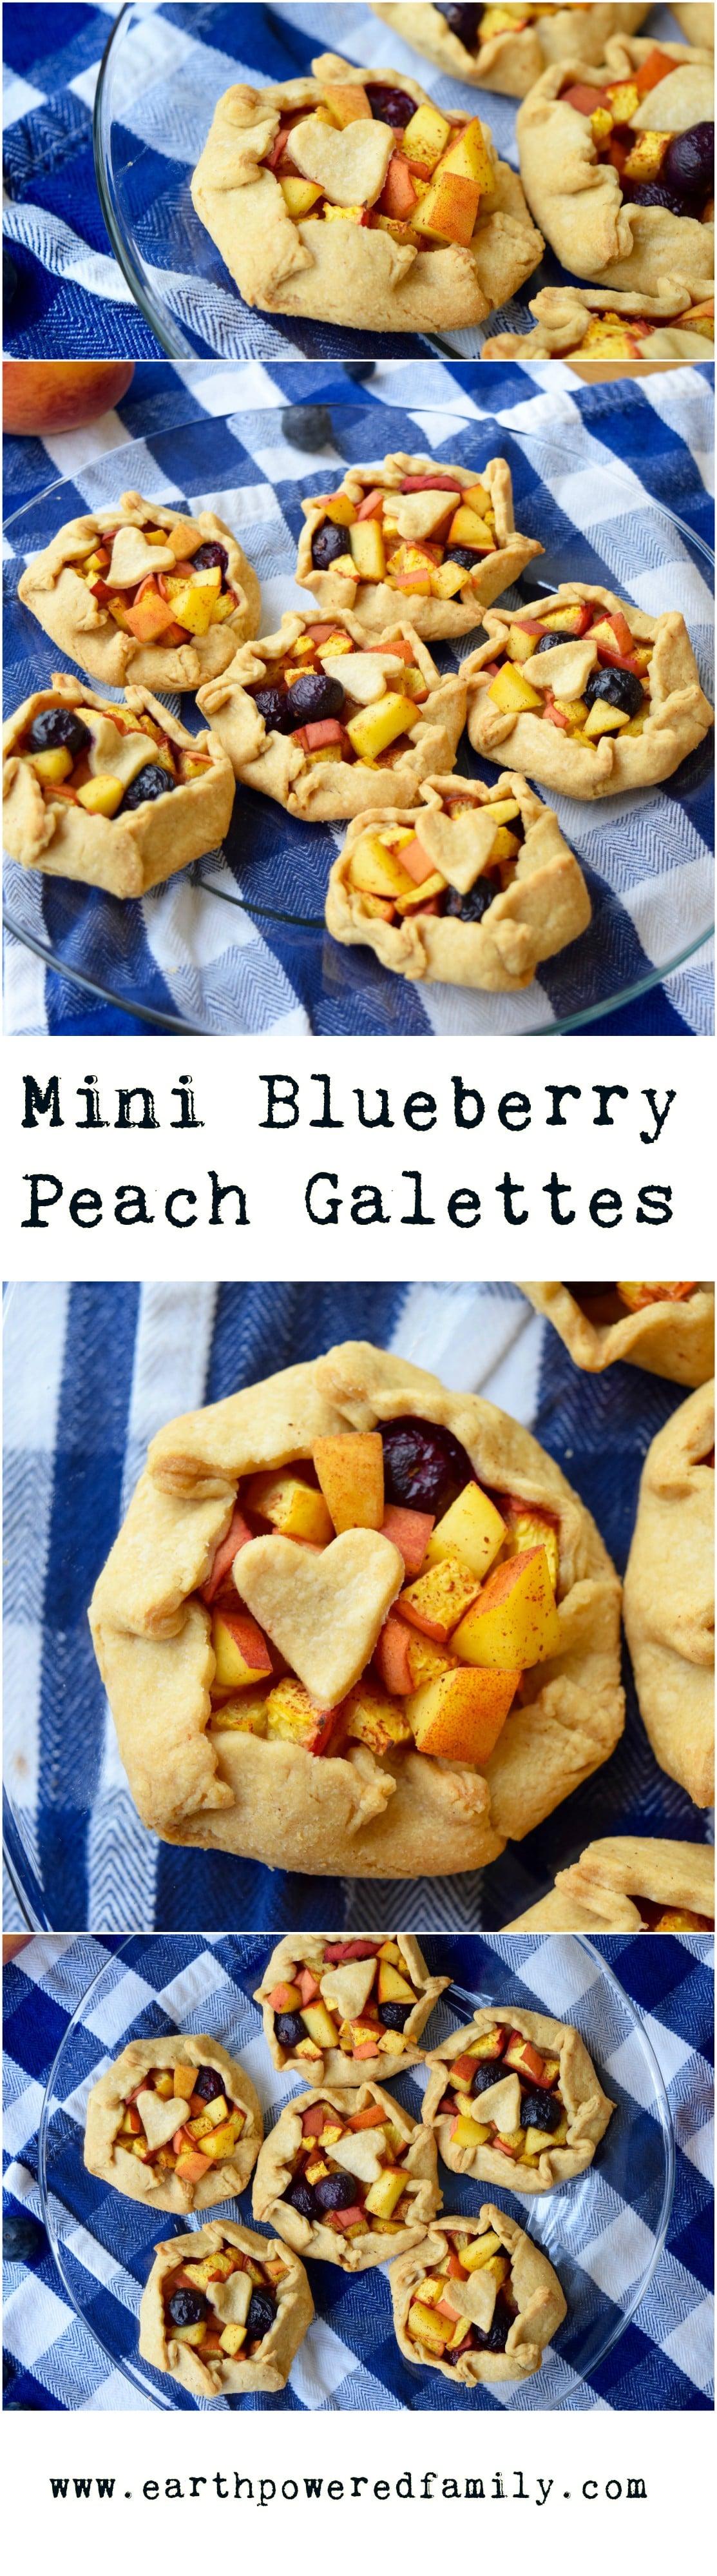 Mini Blueberry Peach Galettes